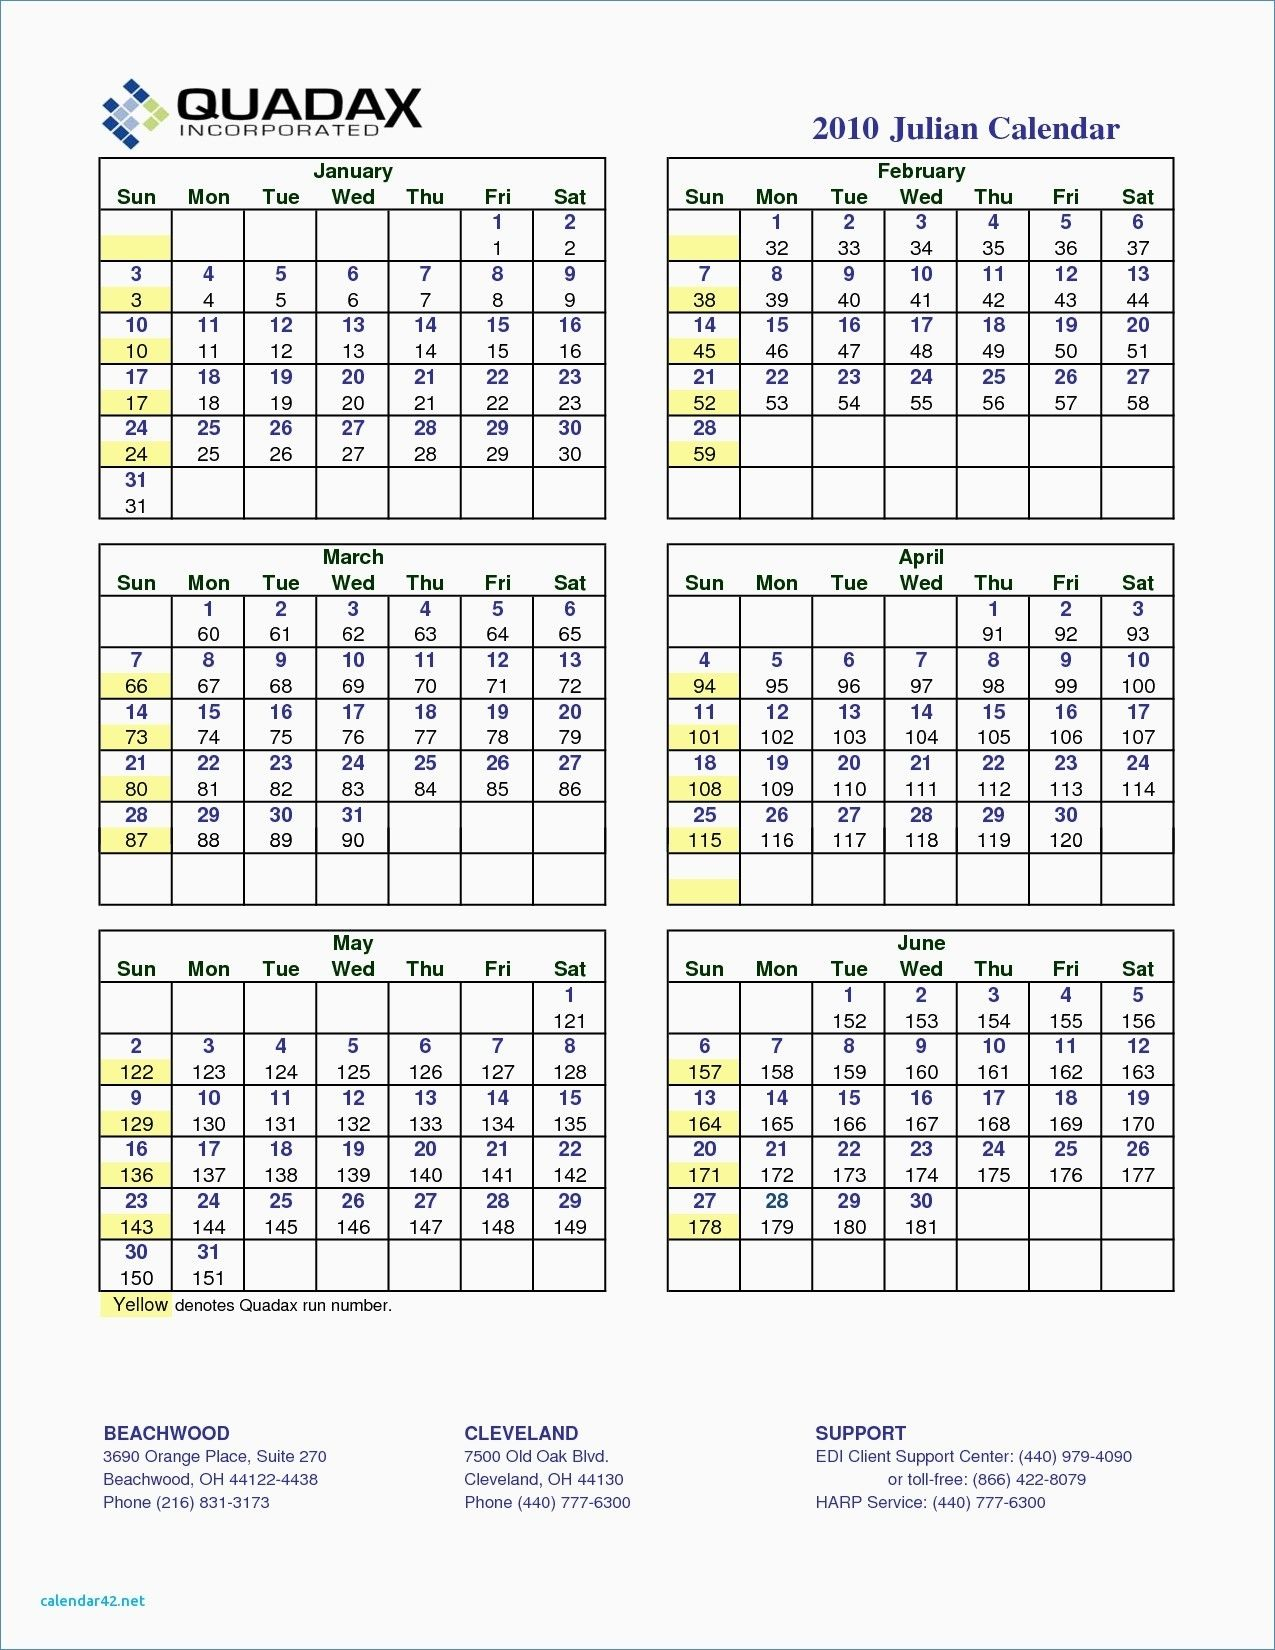 Julian Calendar 2019 Quadax July 2018 Calendar Sri Lanka